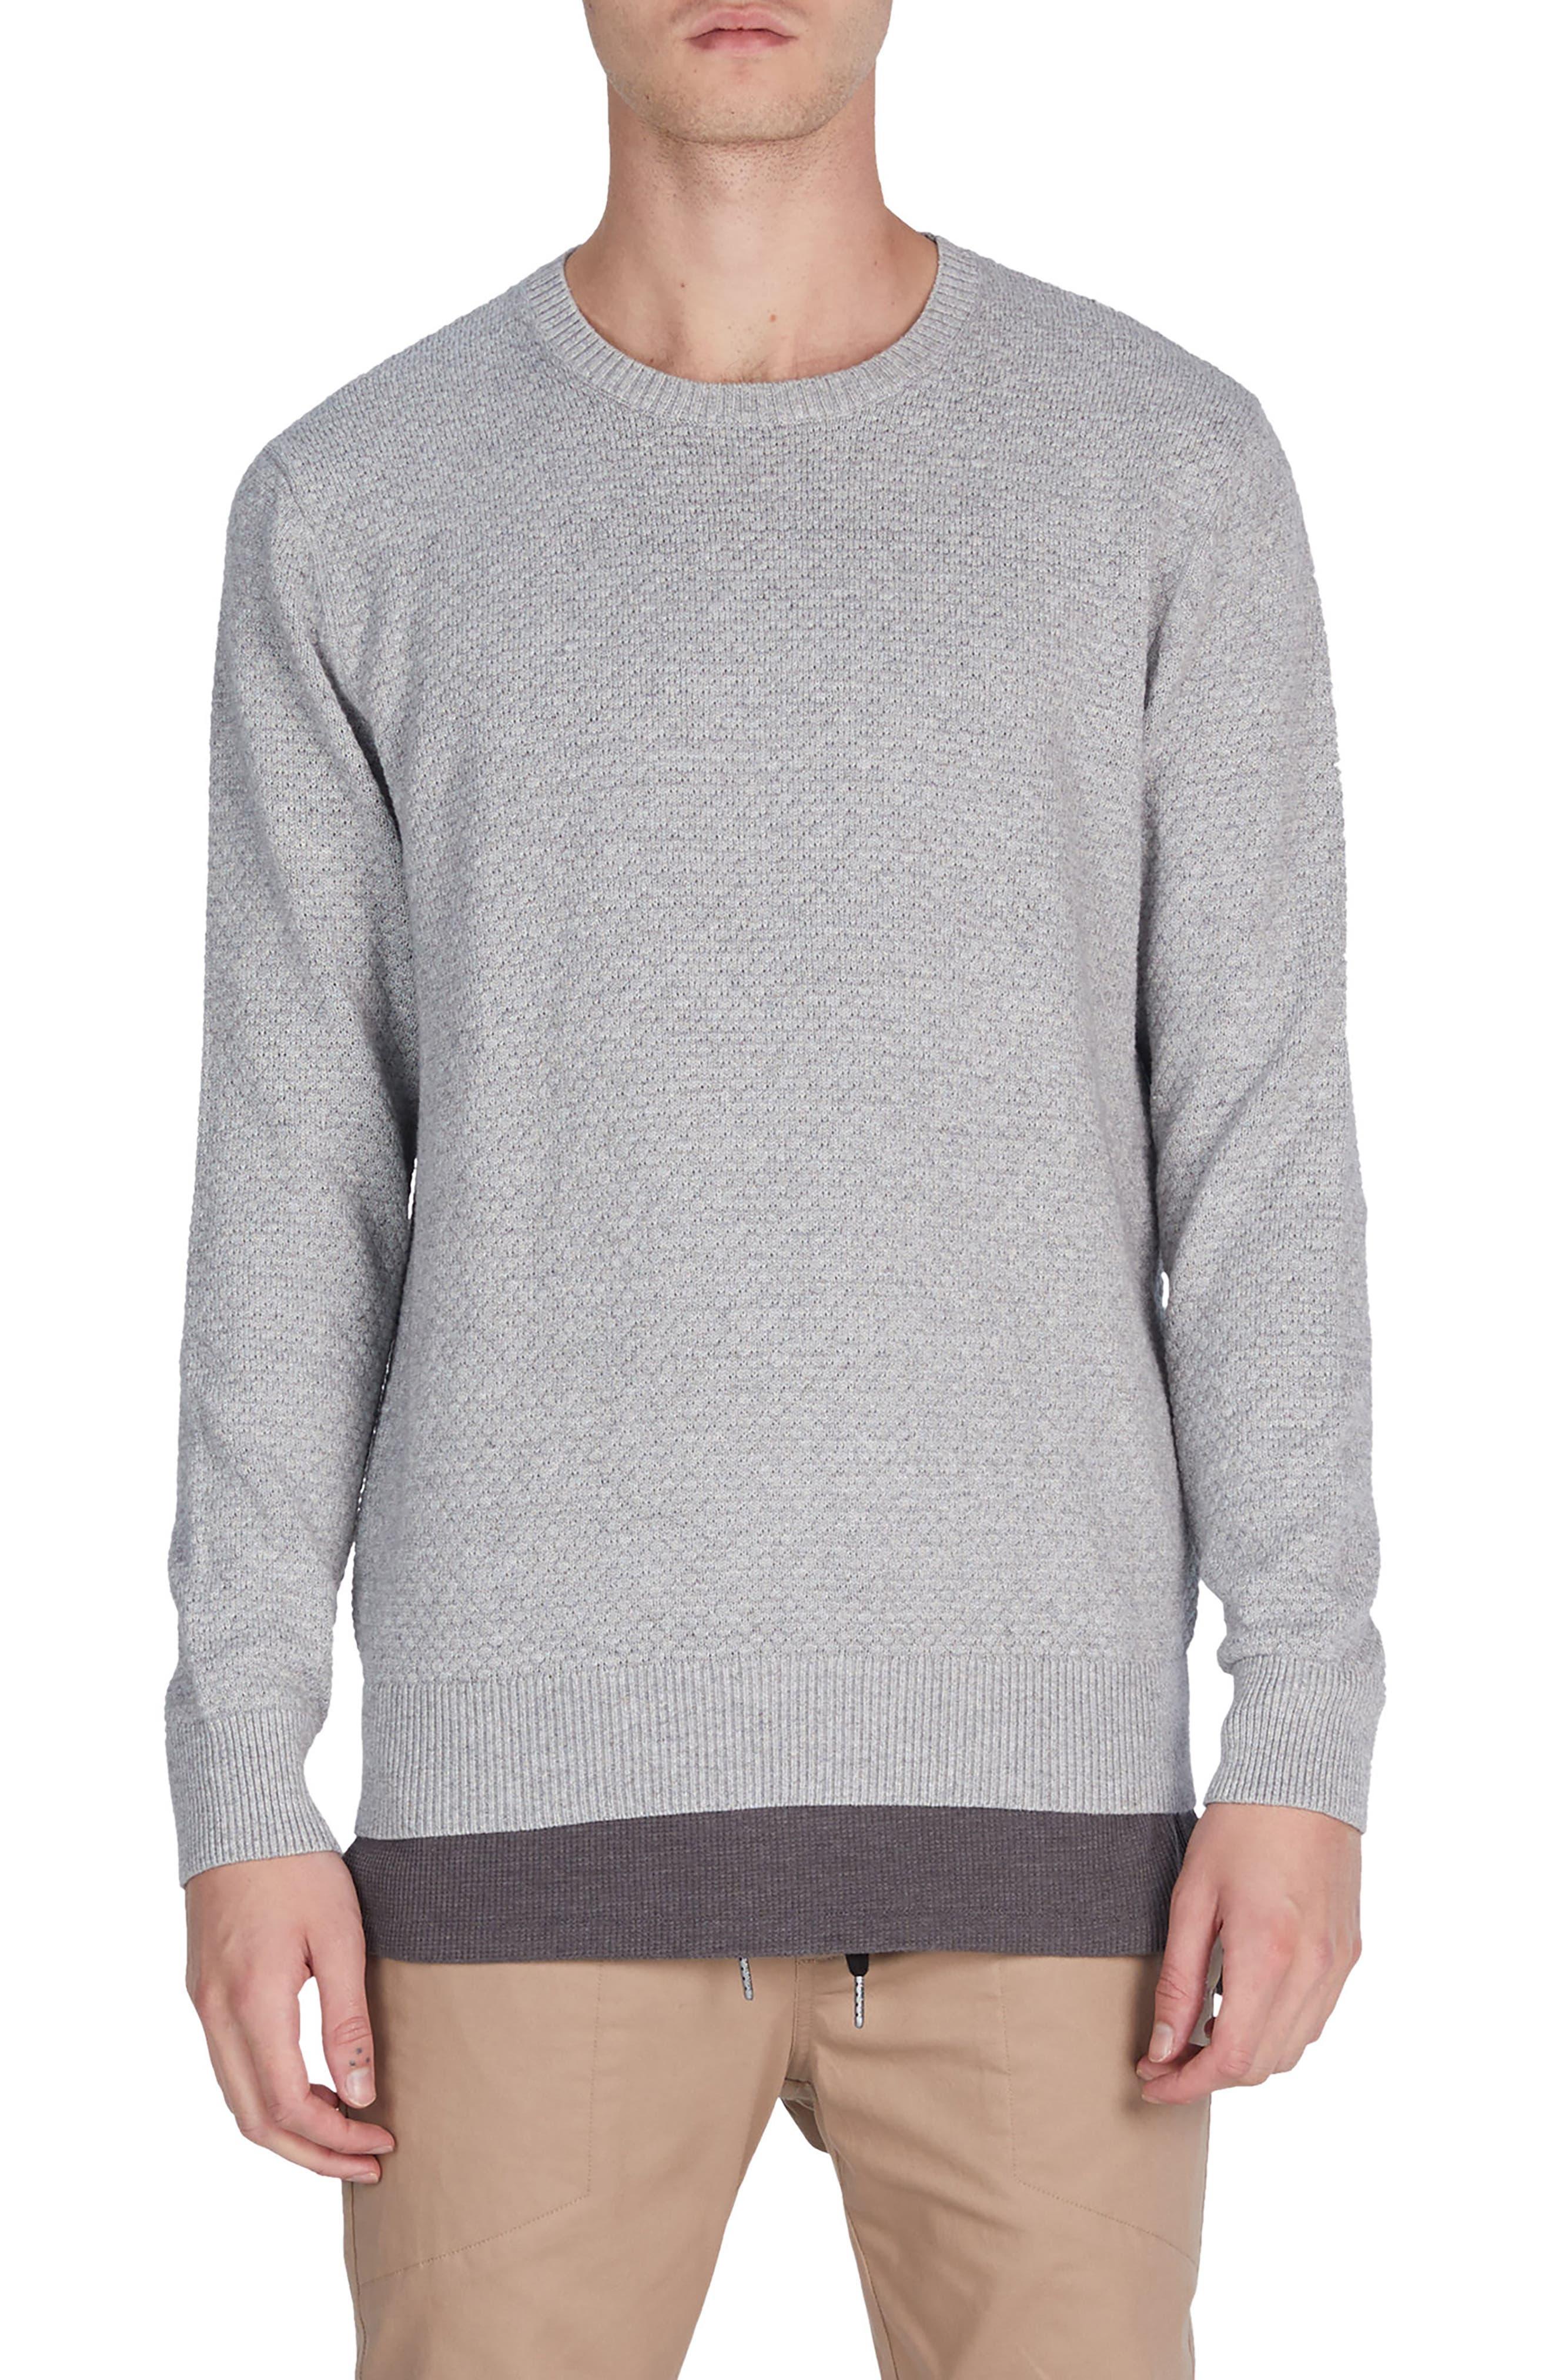 Grip Crewneck Sweater,                         Main,                         color, Grey Marle